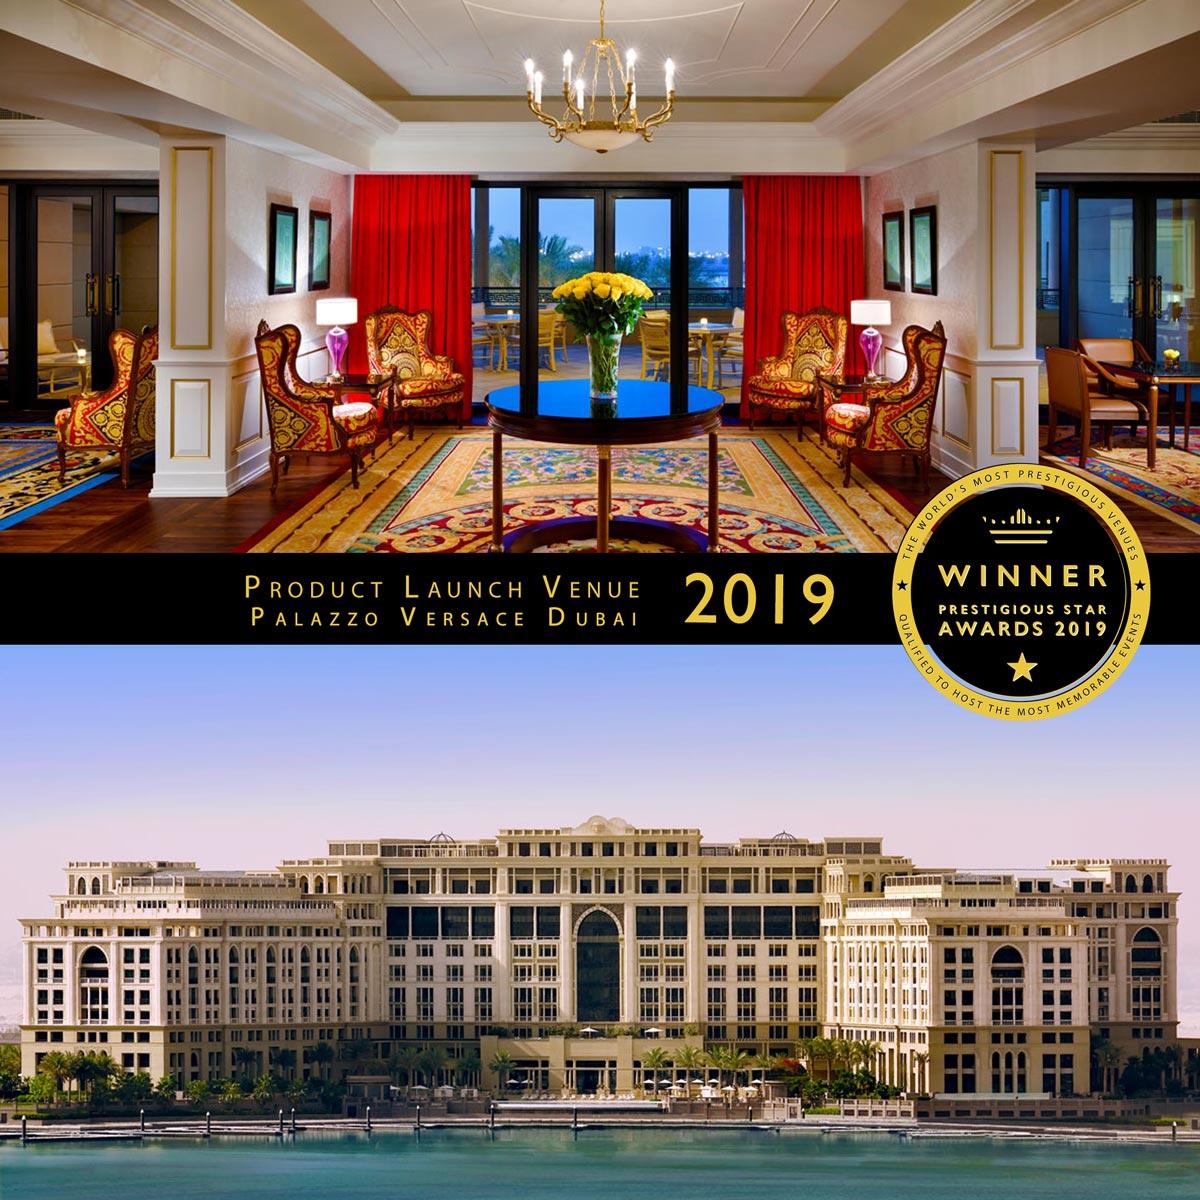 Imperial Suite at Palazzo Versace Dubai